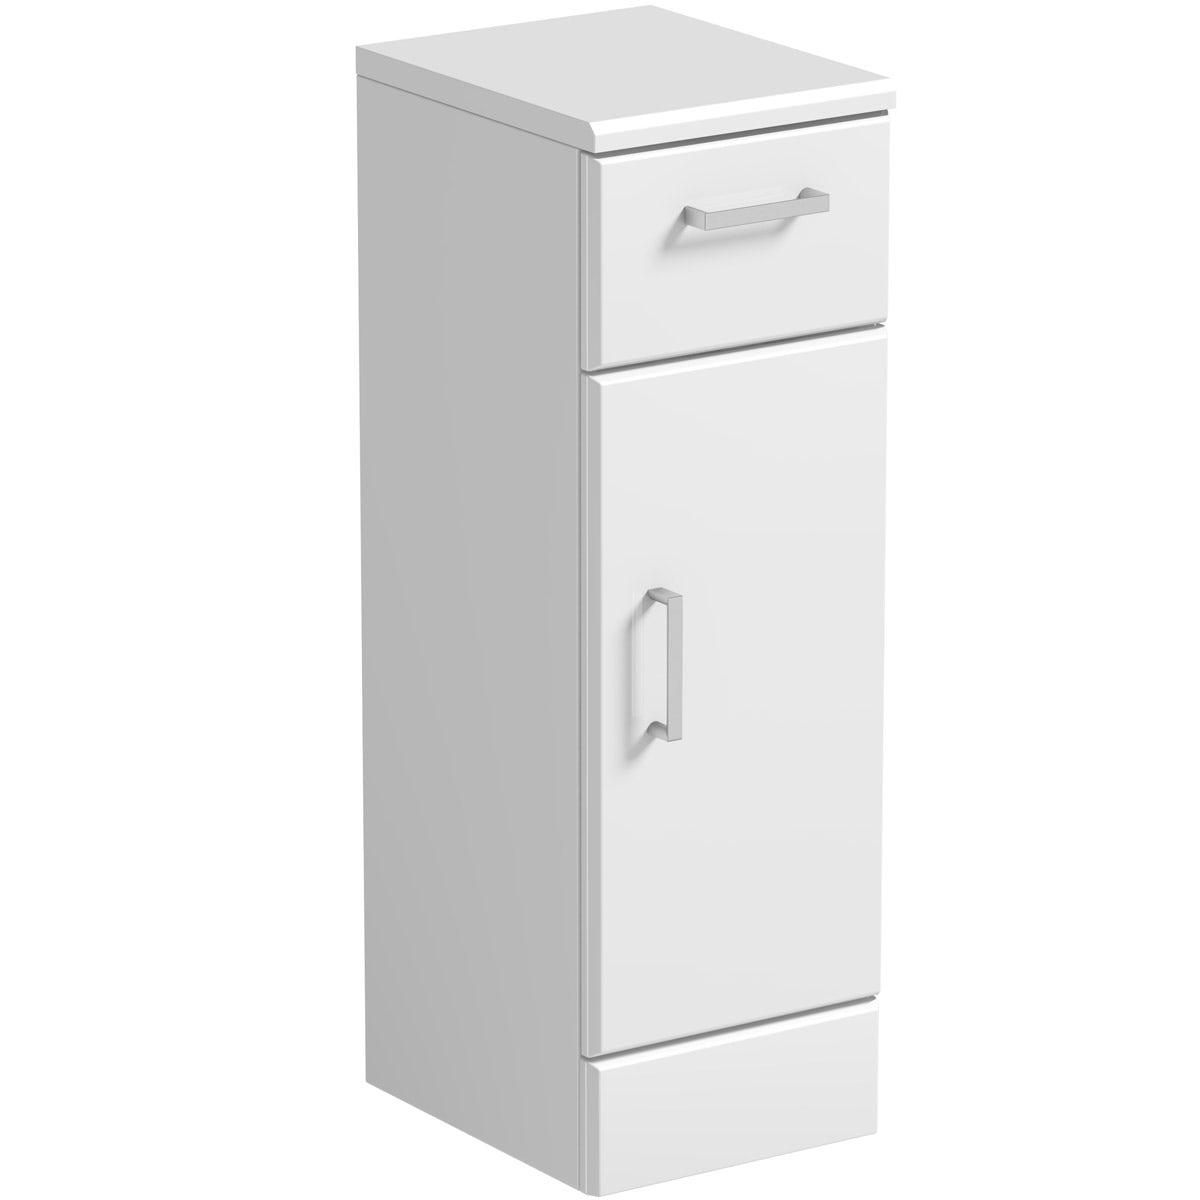 bathroom storage units bathroom storage victoriaplum com rh victoriaplum com bathroom storage unit white bathroom storage units ikea